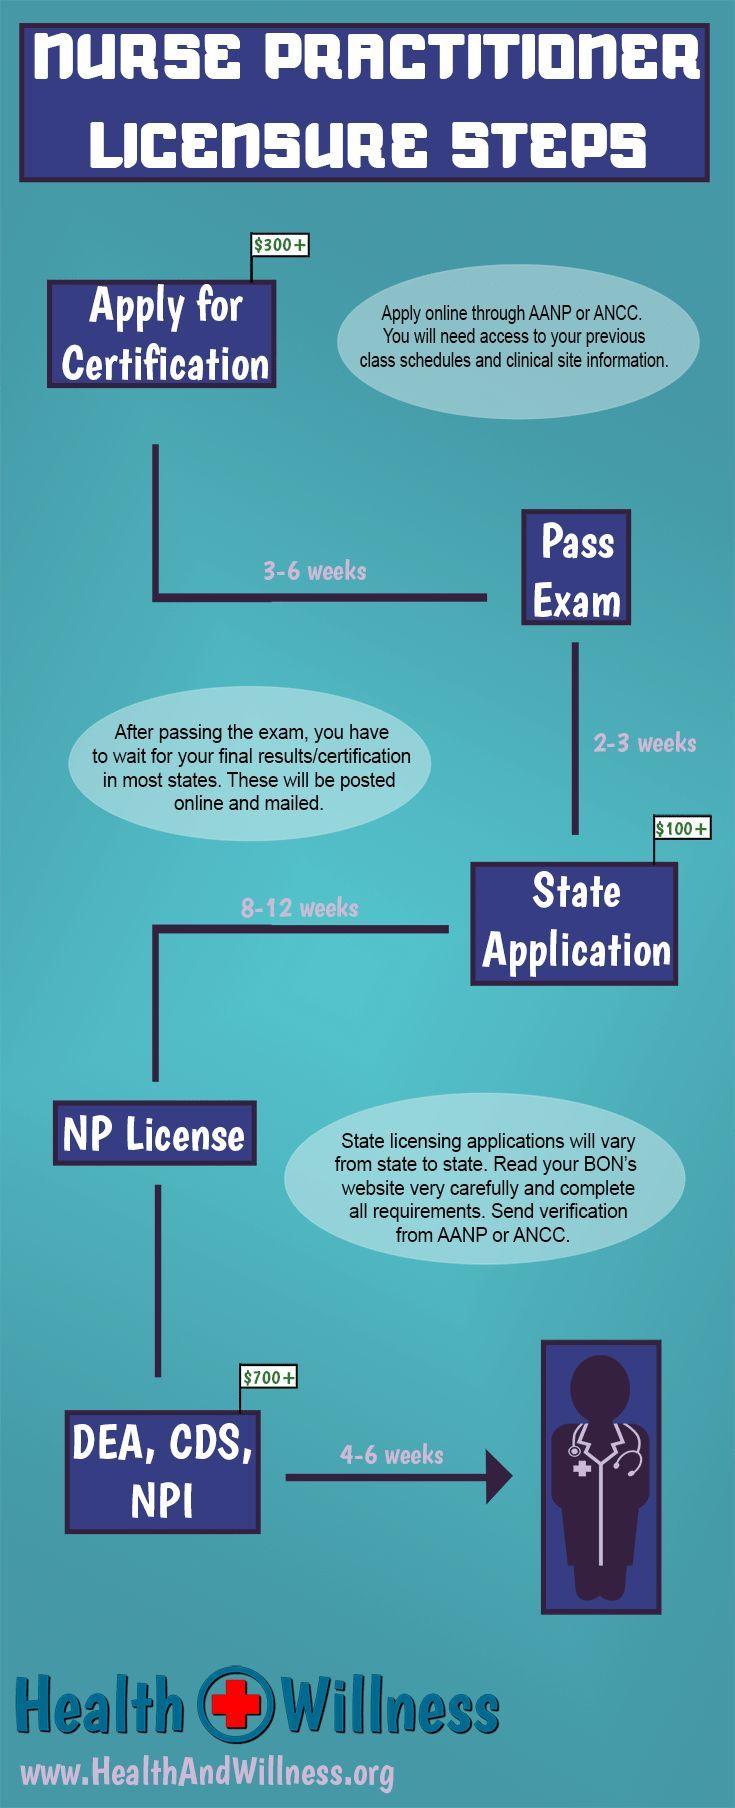 Np credentialing process steps after graduation nursing